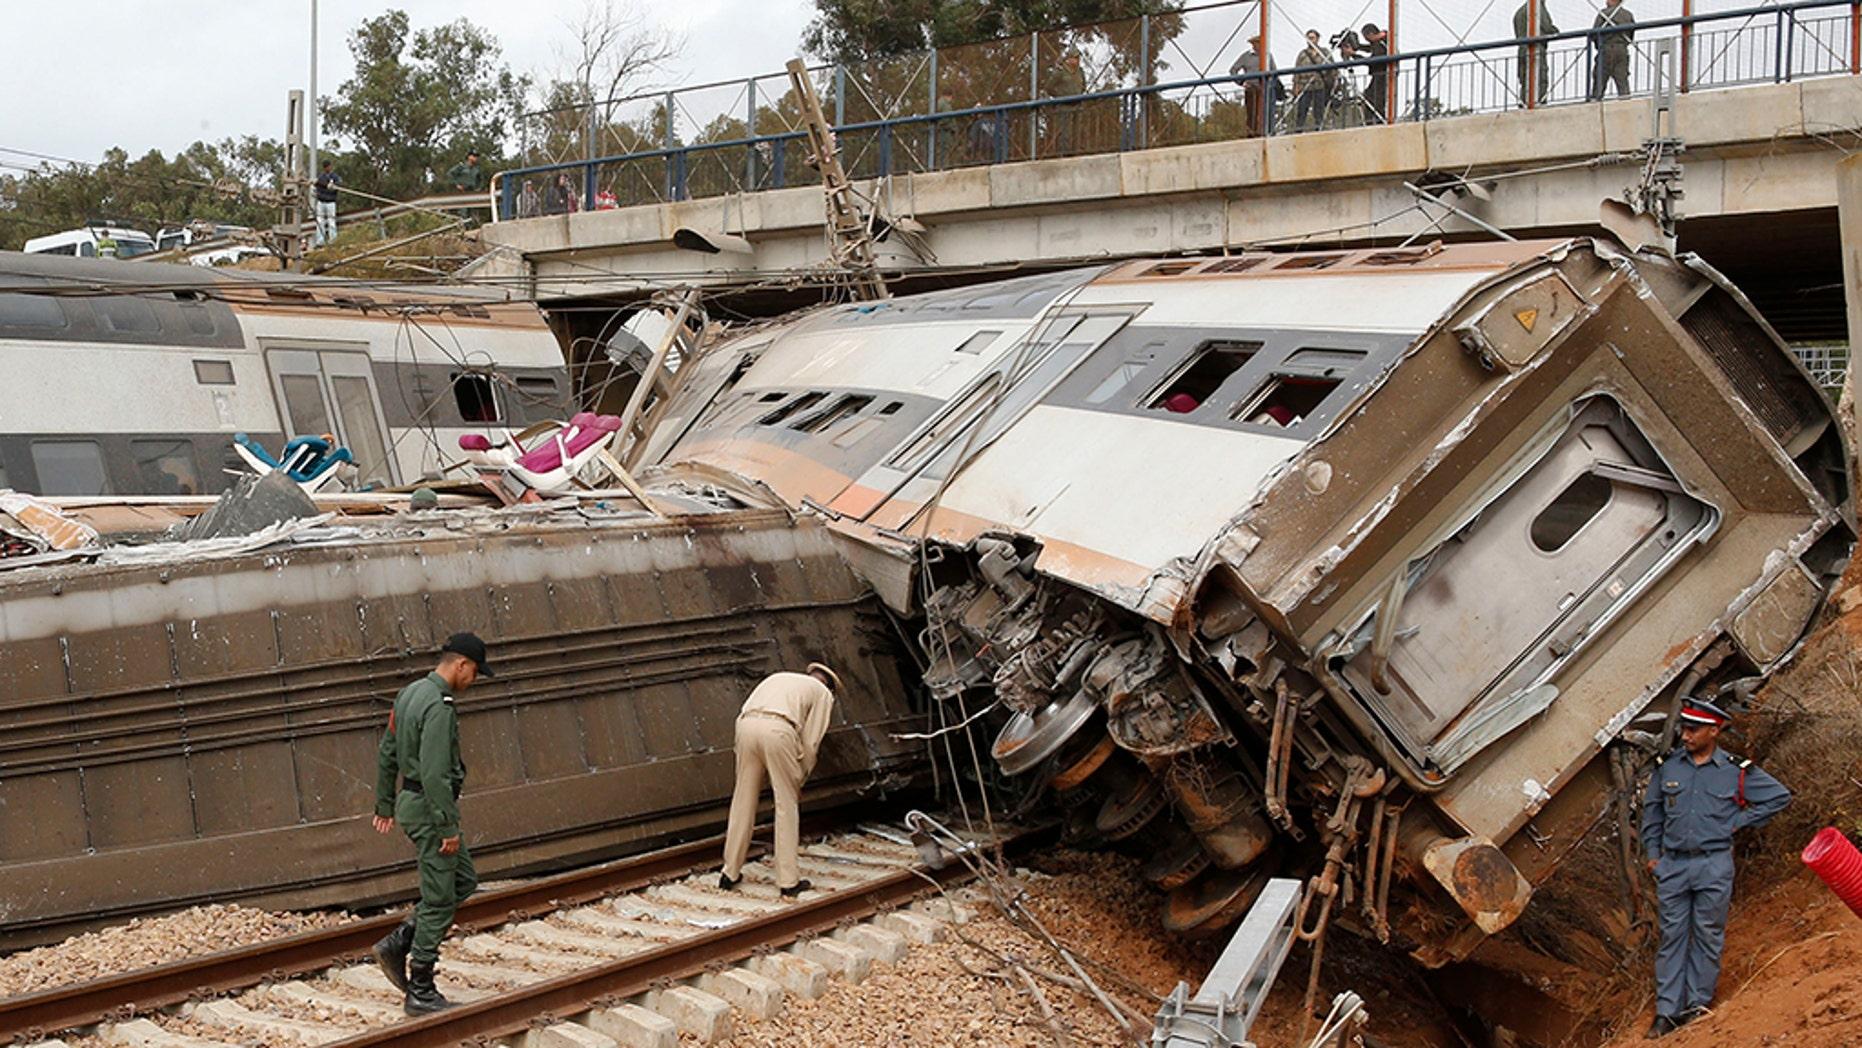 Morocco train derailment kills 7, injures nearly 80 | Fox News